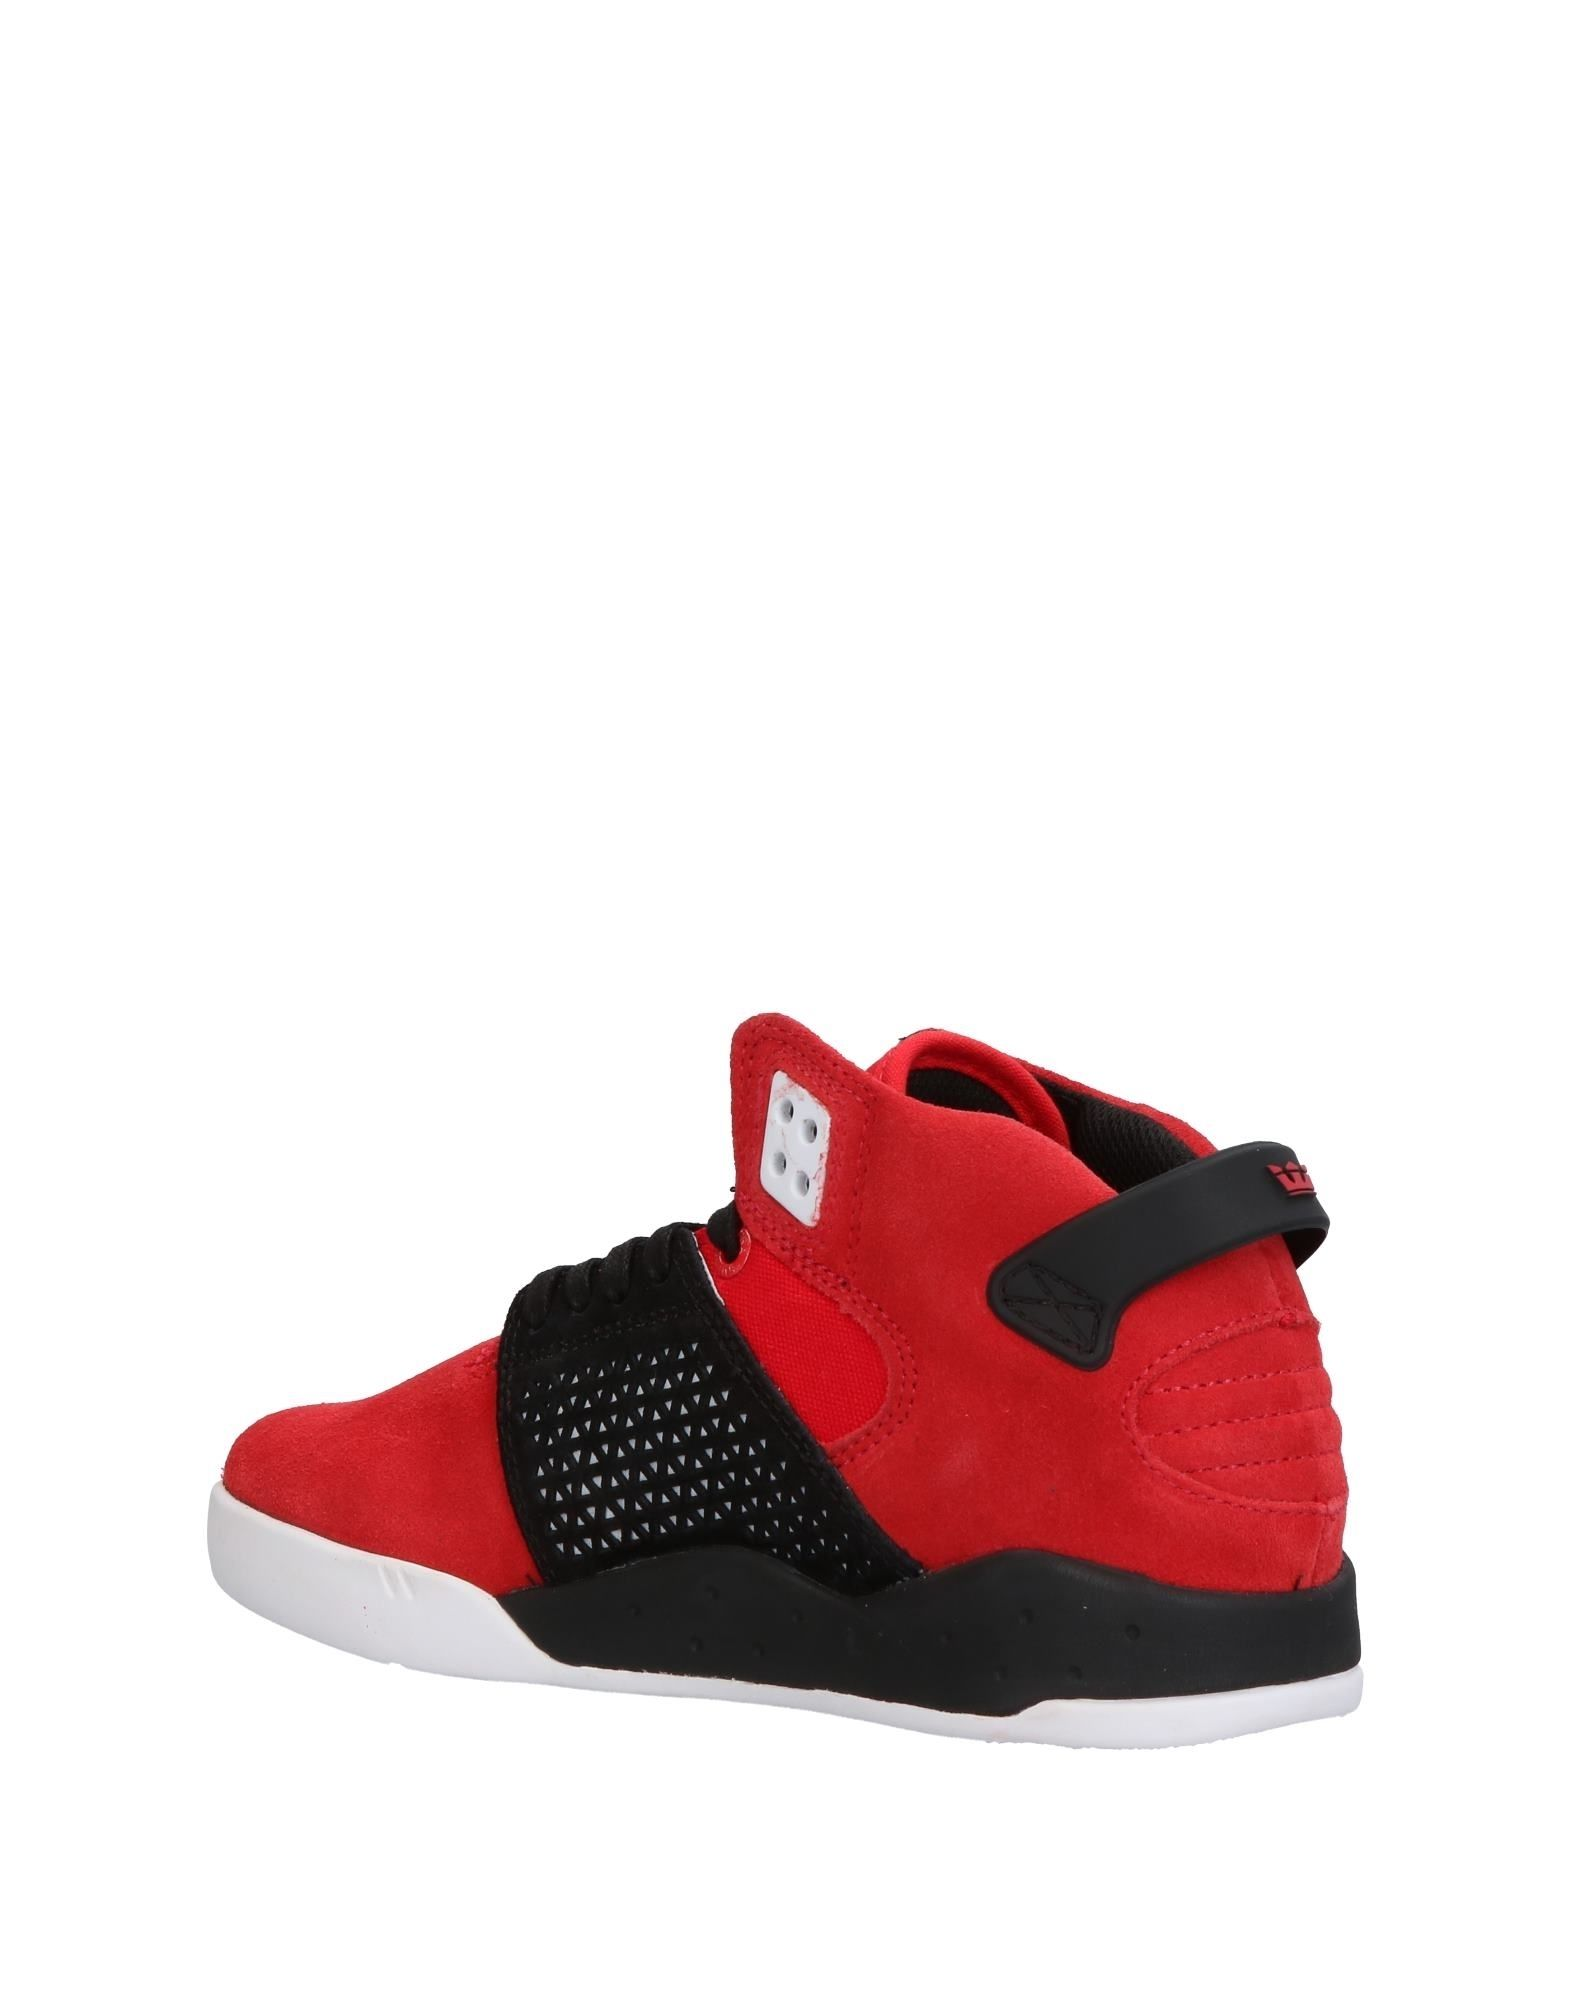 Sneakers Supra Femme - Sneakers Supra sur